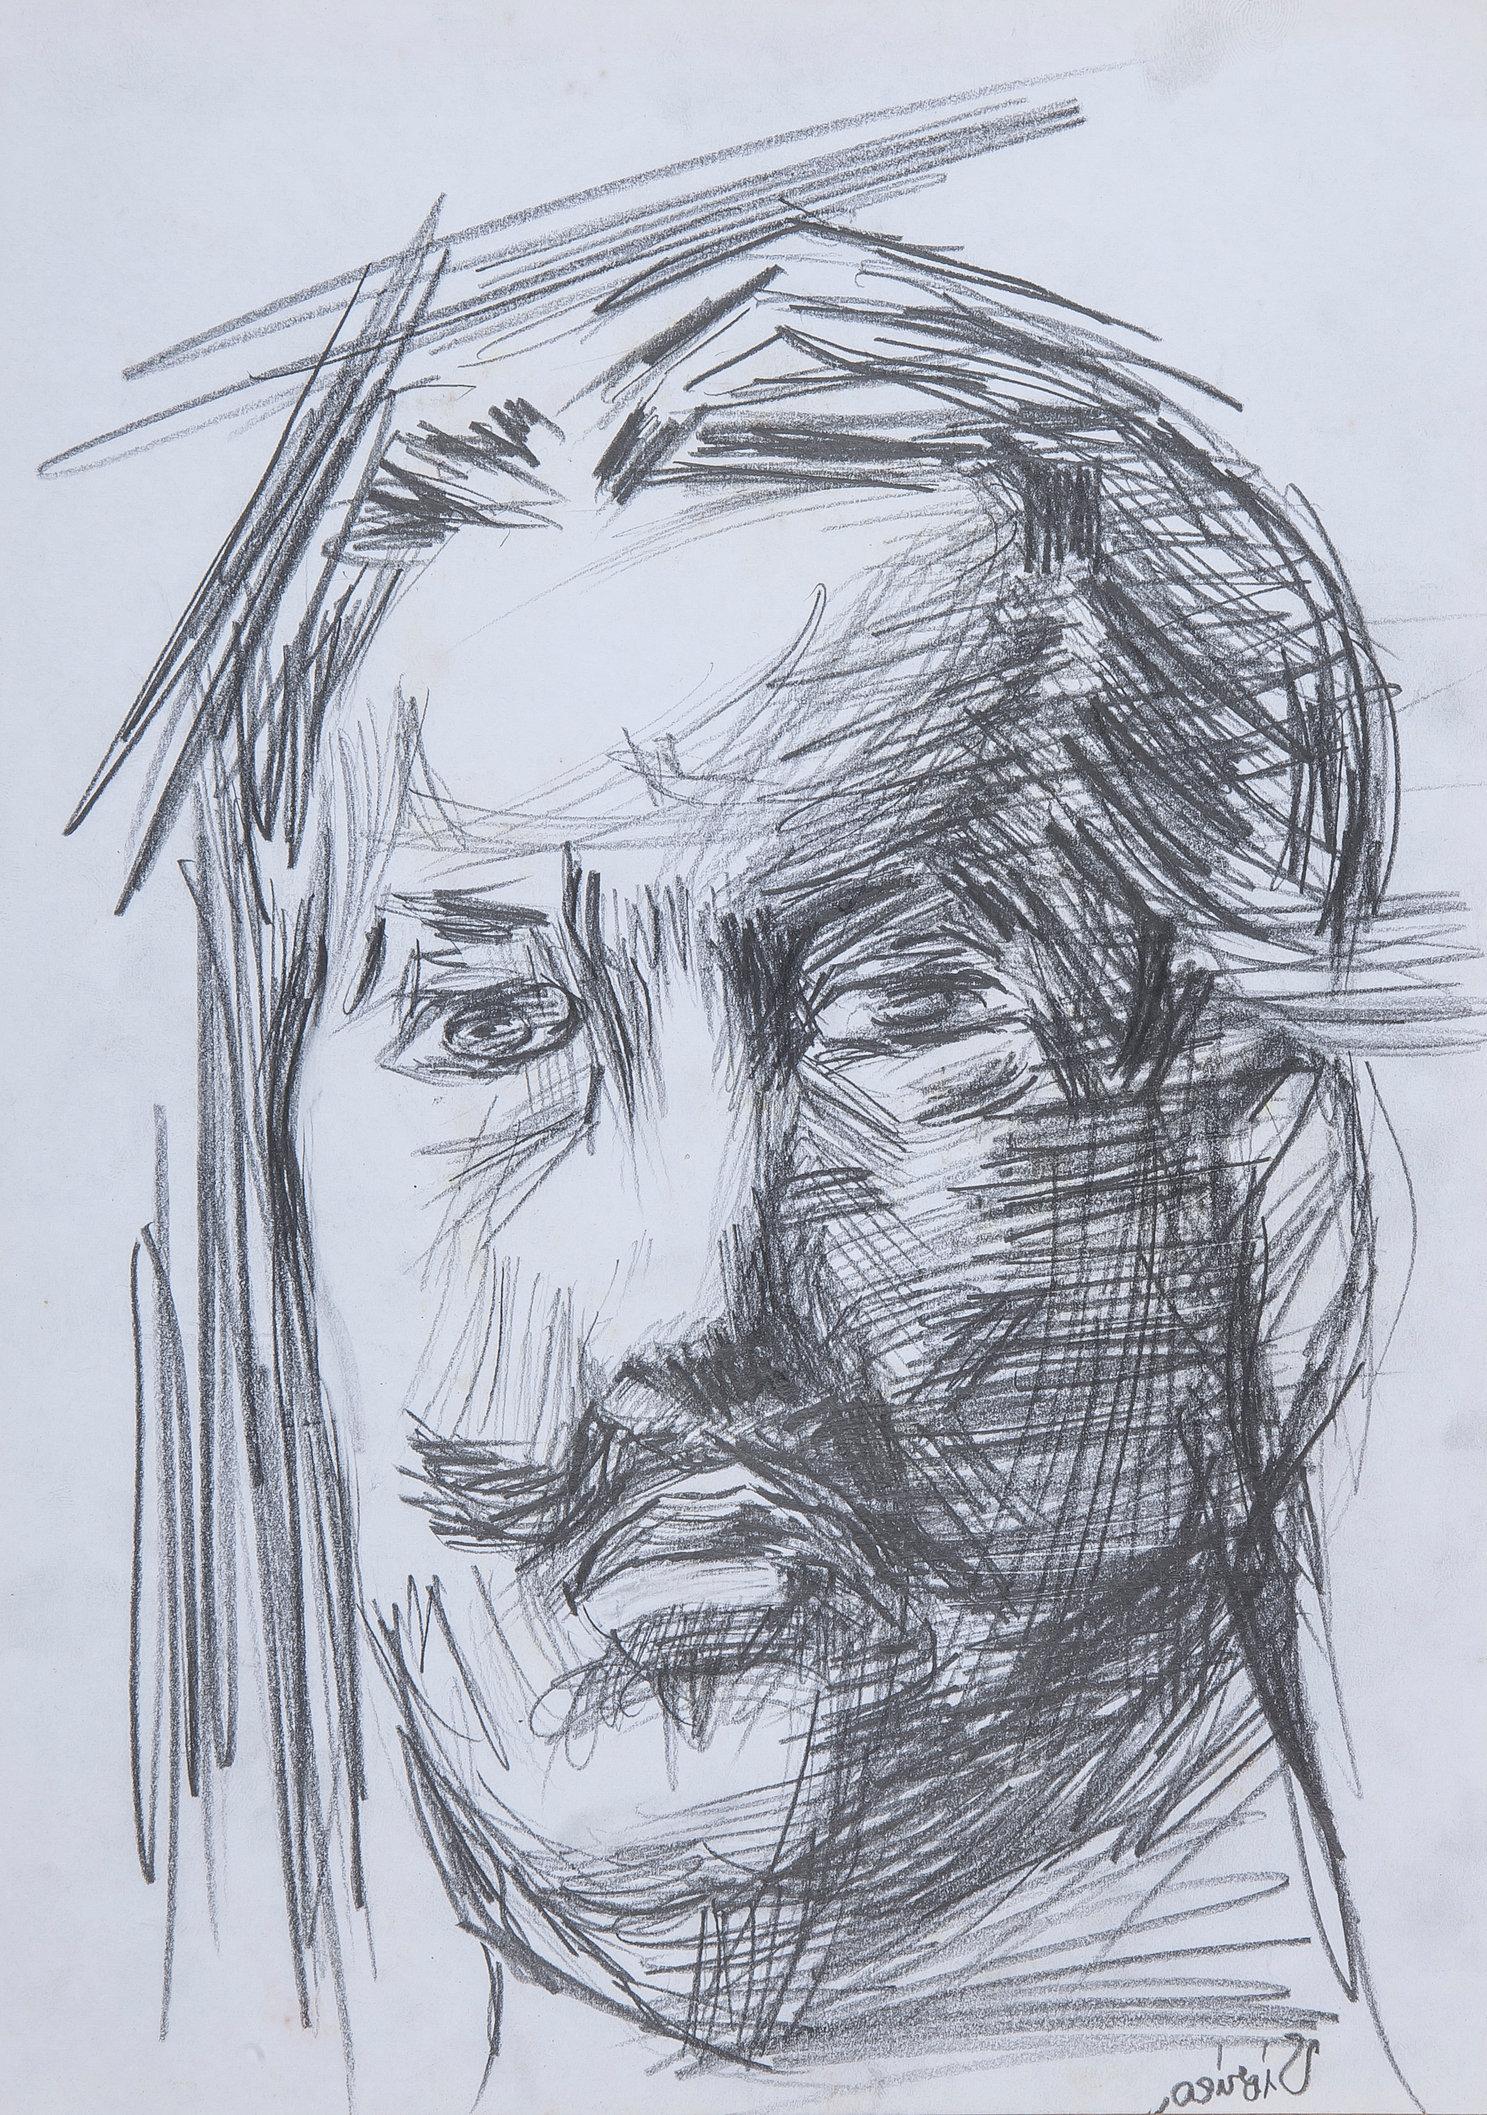 Gheorghe Petrascu's Self Portrait Study